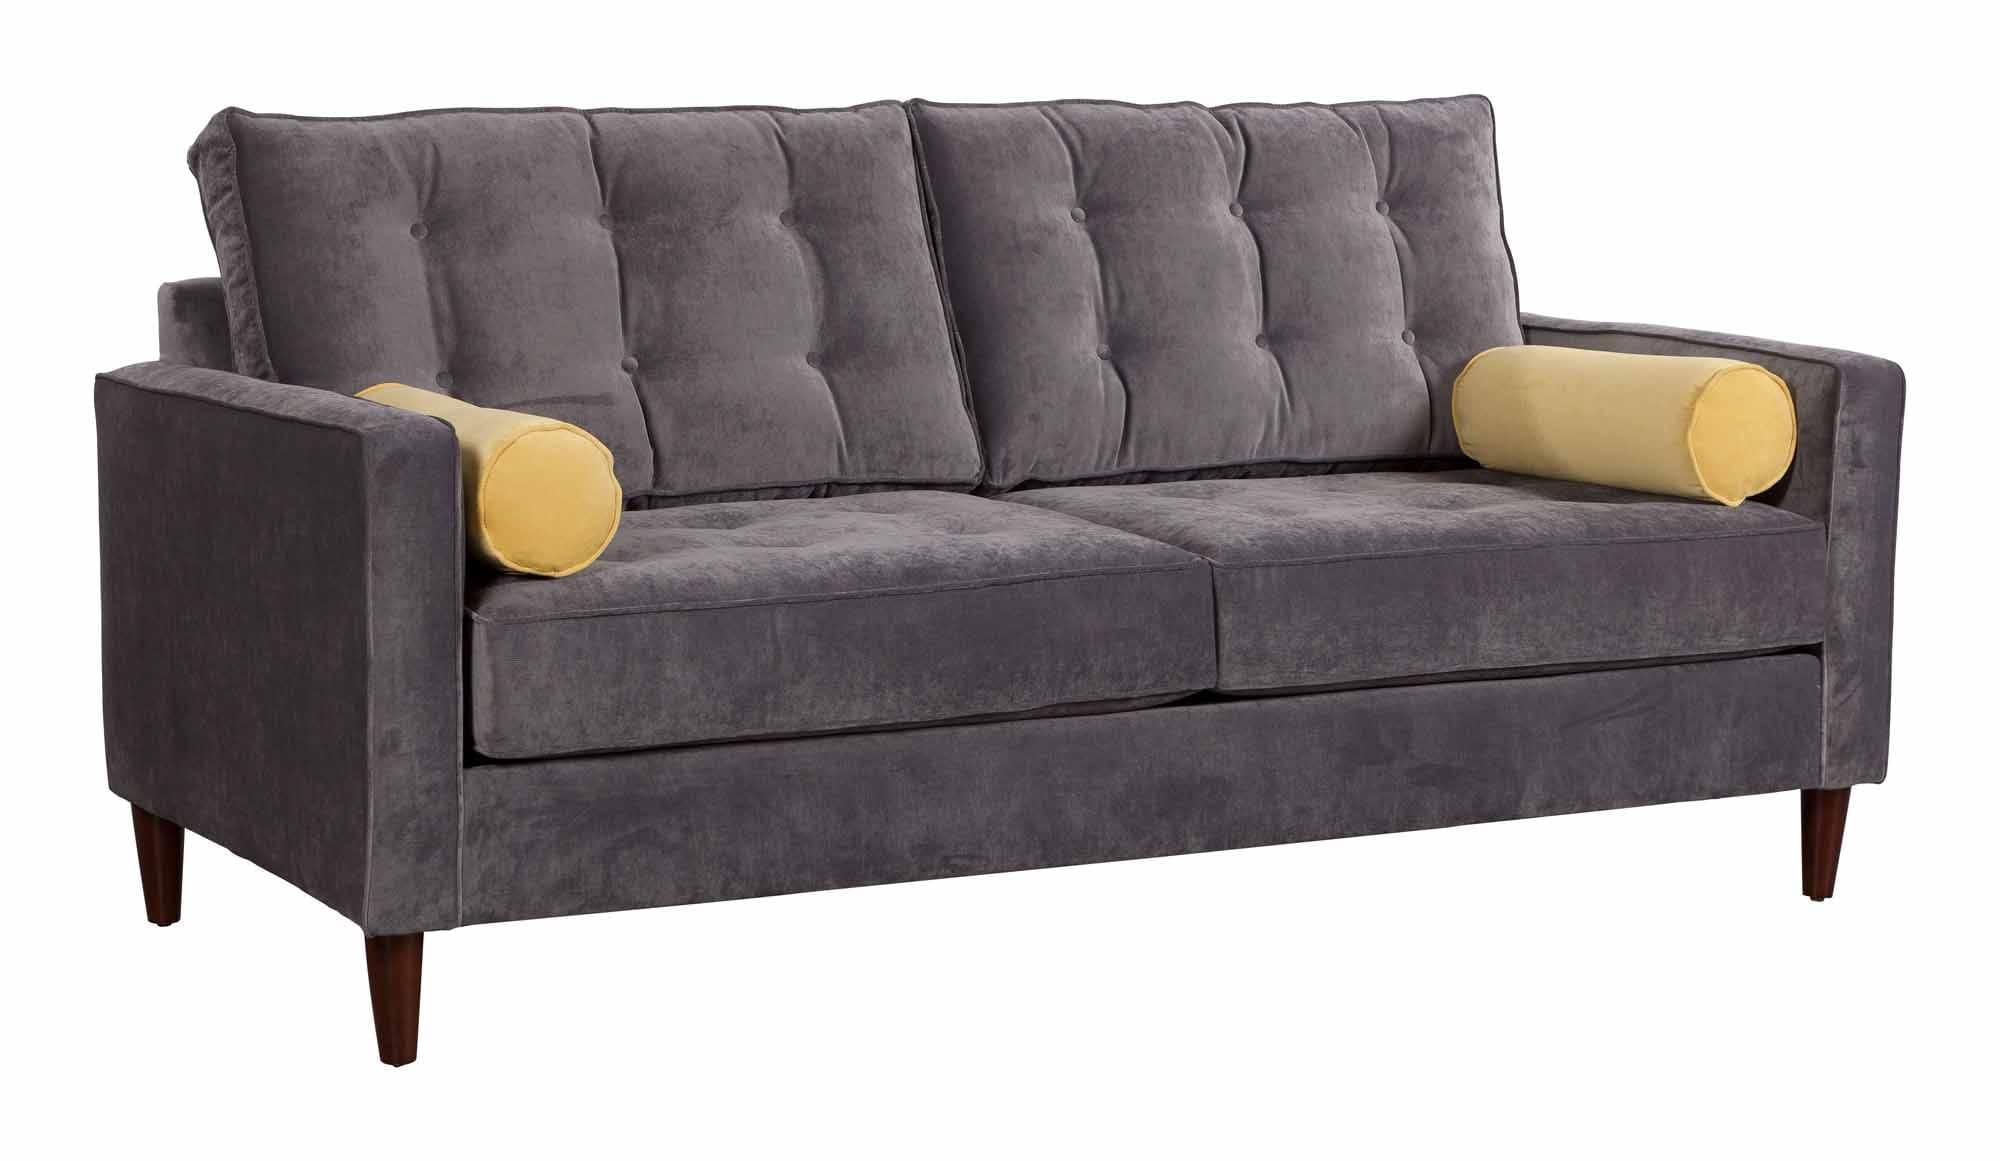 ferguson copeland leather sofa ashley hillspring reviews savannah monica förster design studio thesofa